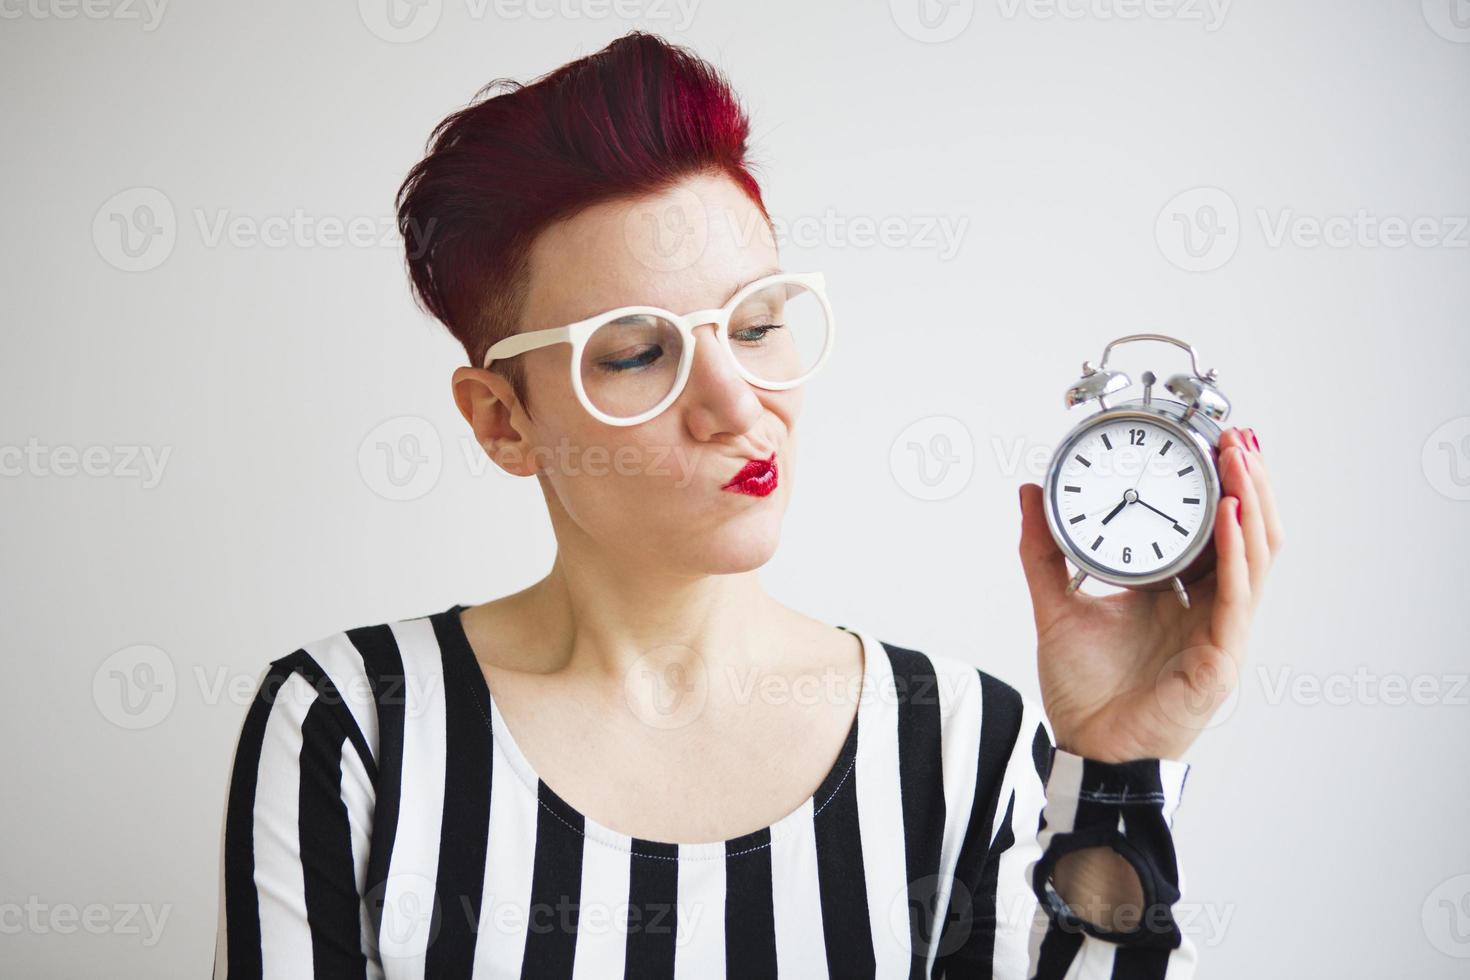 mujer pelirroja con despertador mirando molesto foto